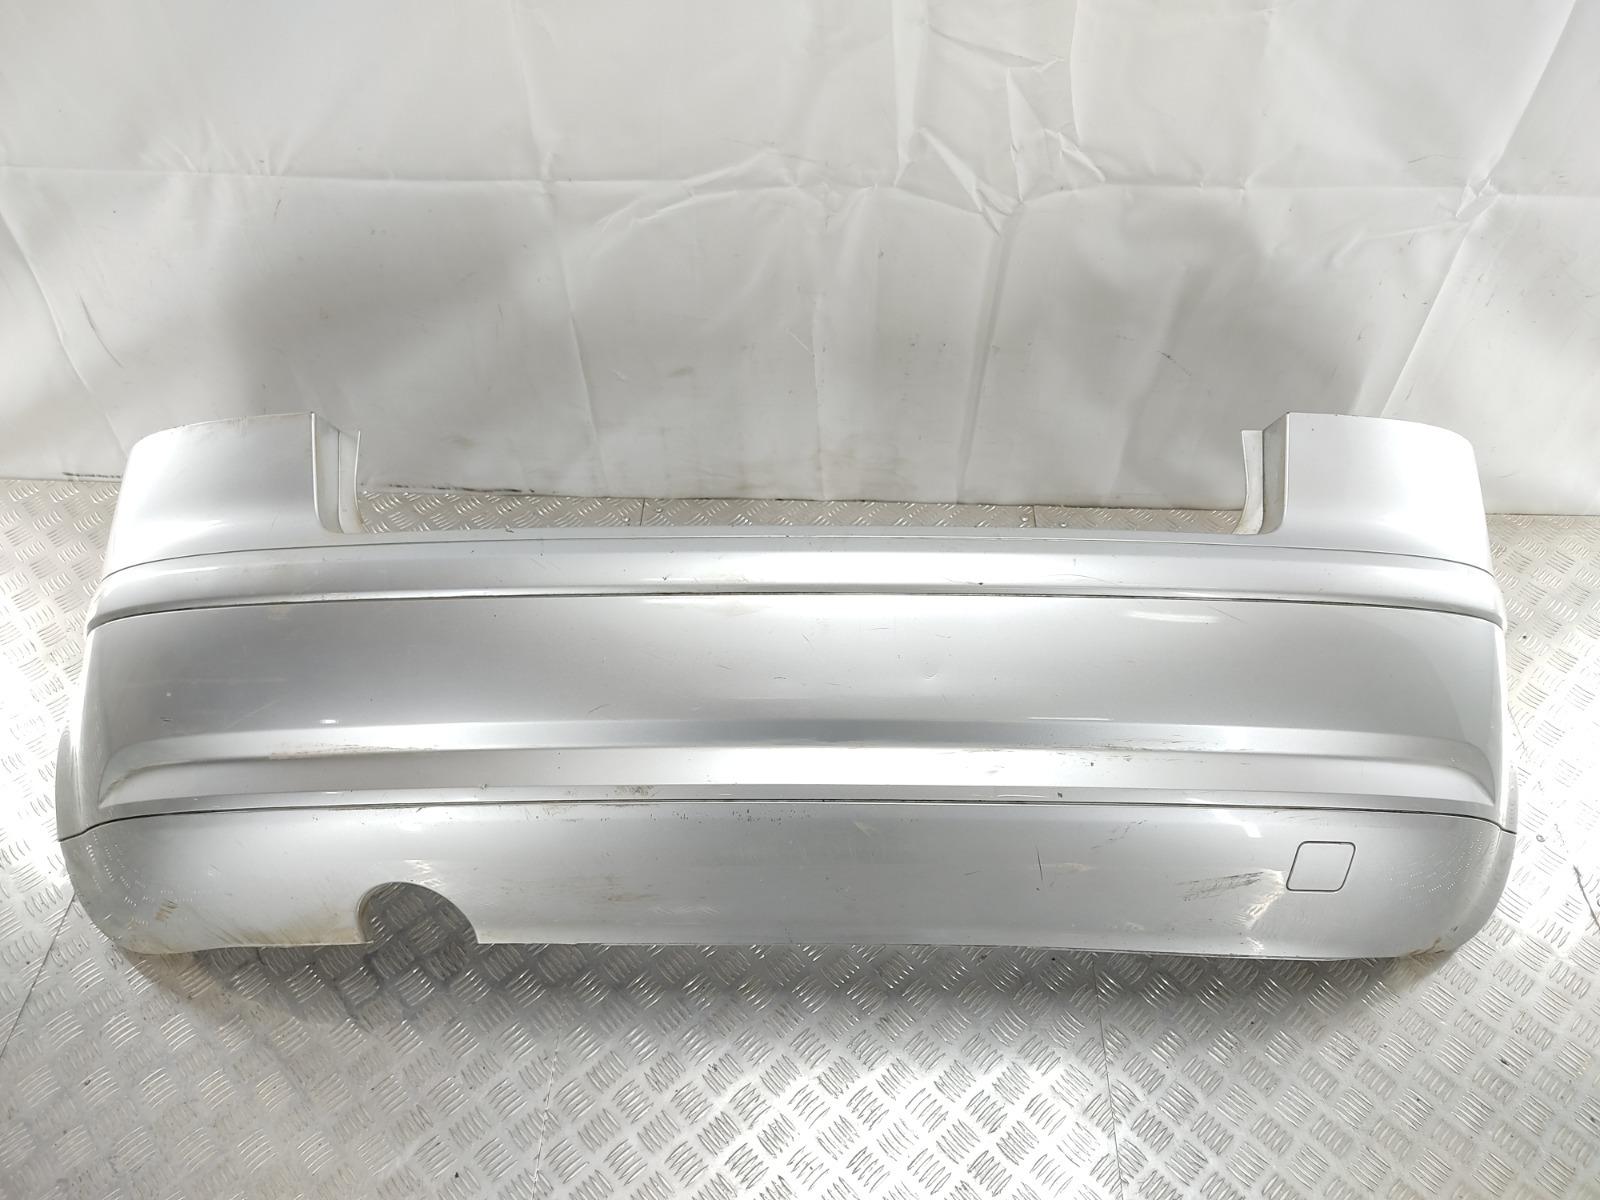 Бампер задний Audi A3 8P 1.6 I 2007 (б/у)